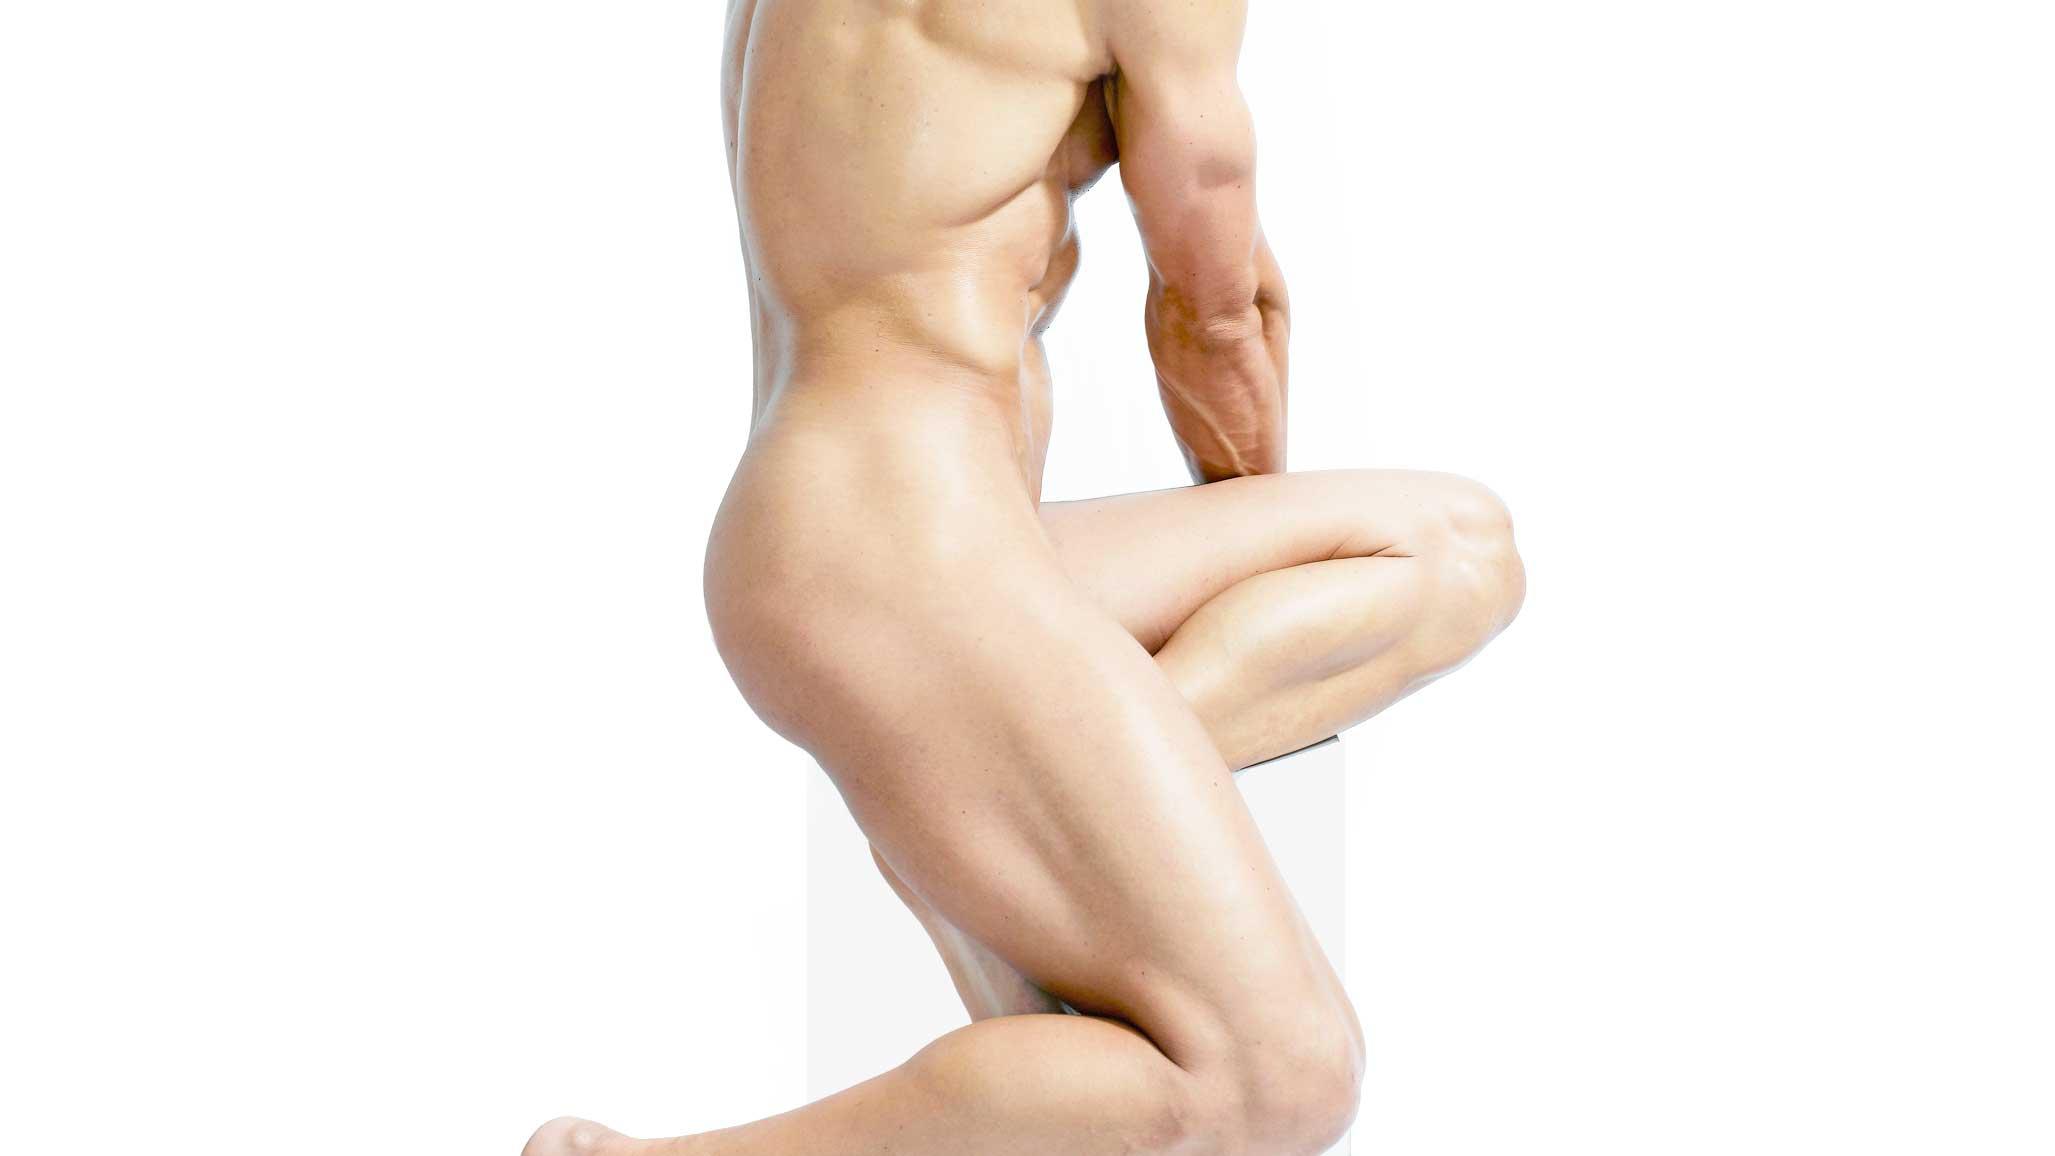 Depilación masculina zona genital Madrid | Clínica Médico Estética Teresa Nieto